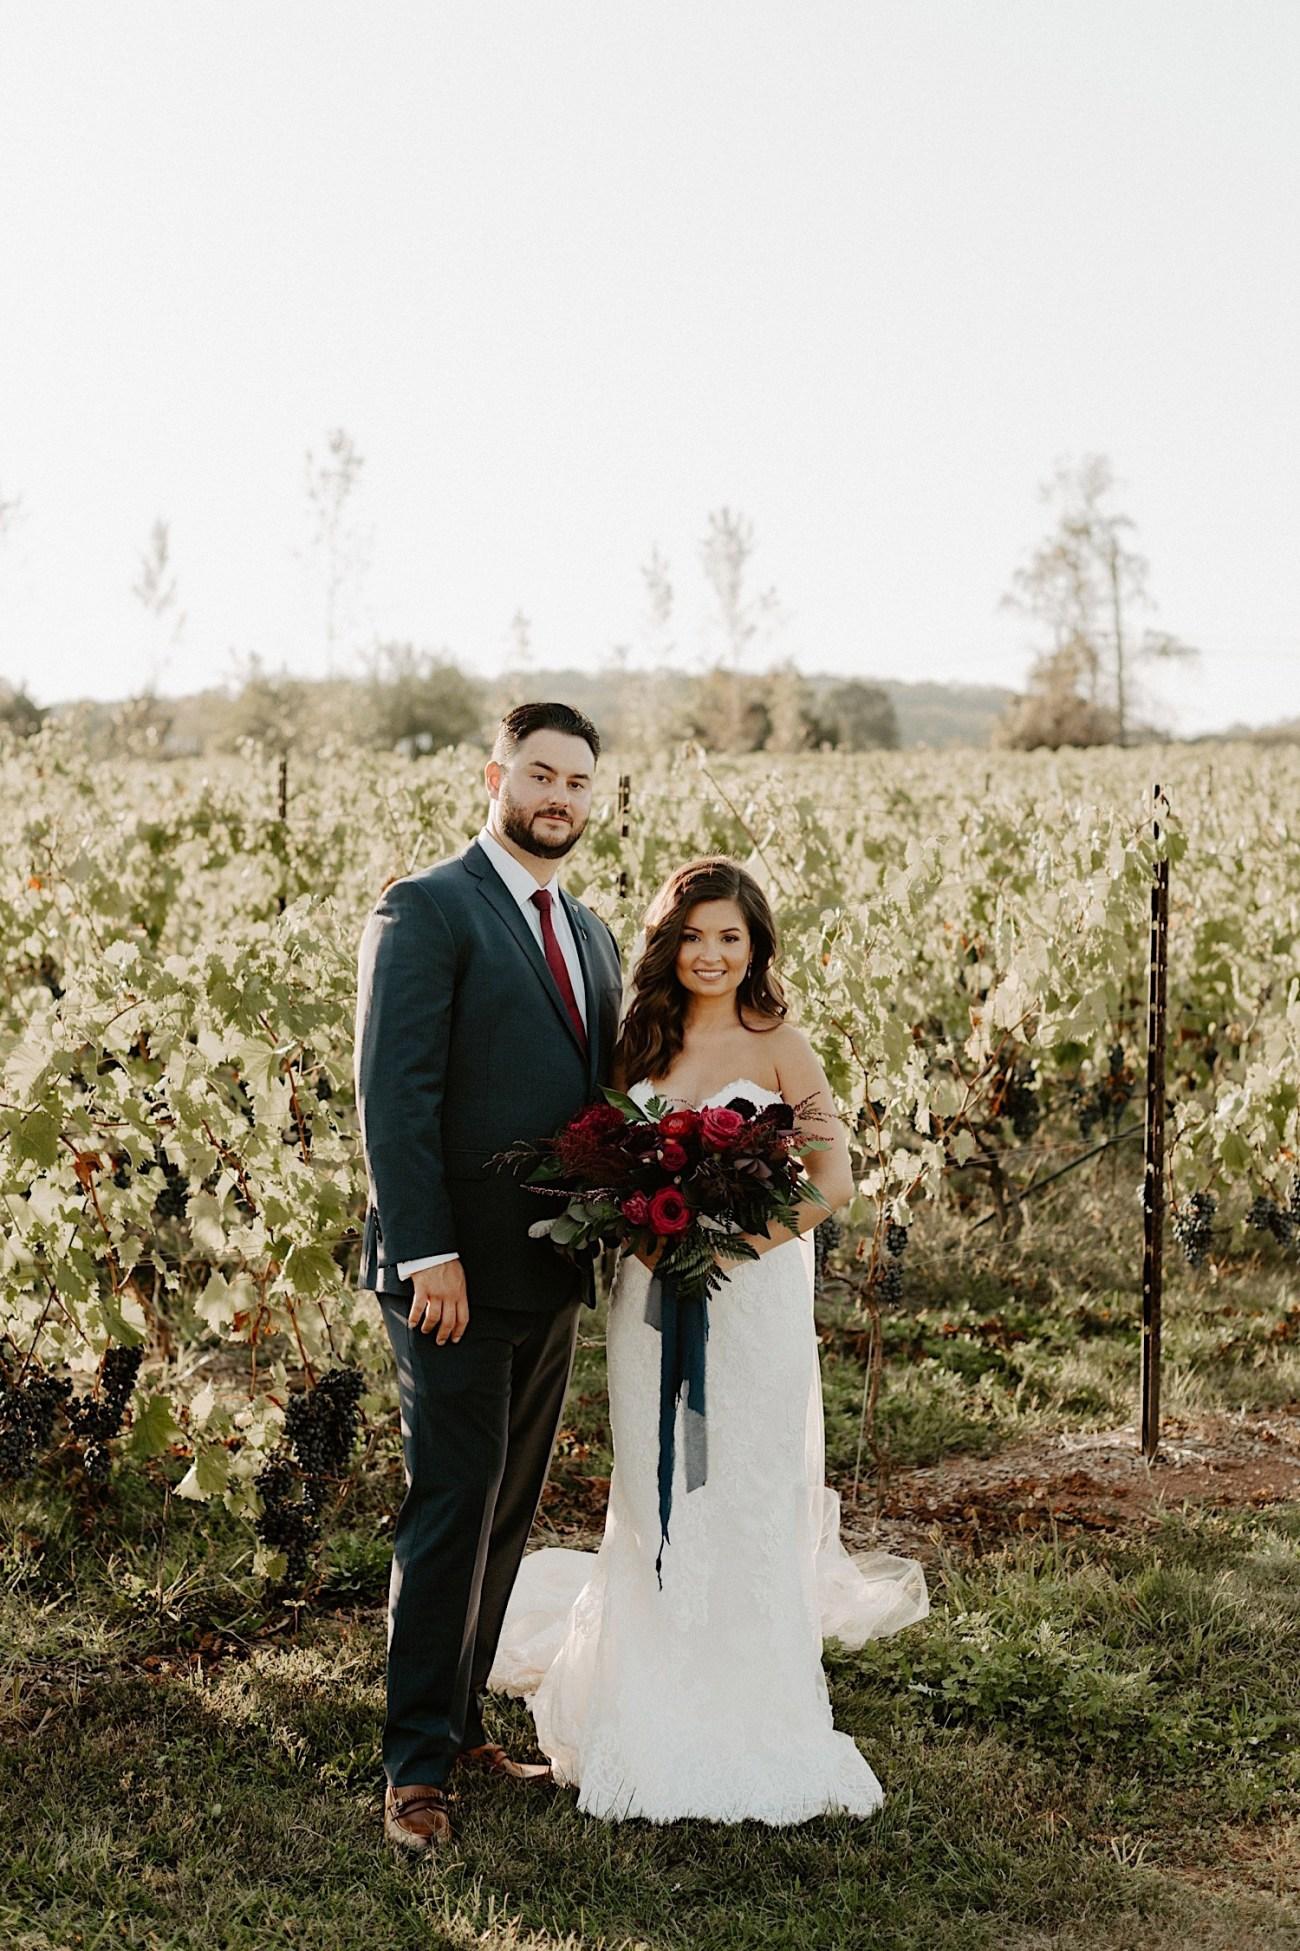 Hopewell Valley Vineyards Wedding New Jersey Wedding Photographer 12